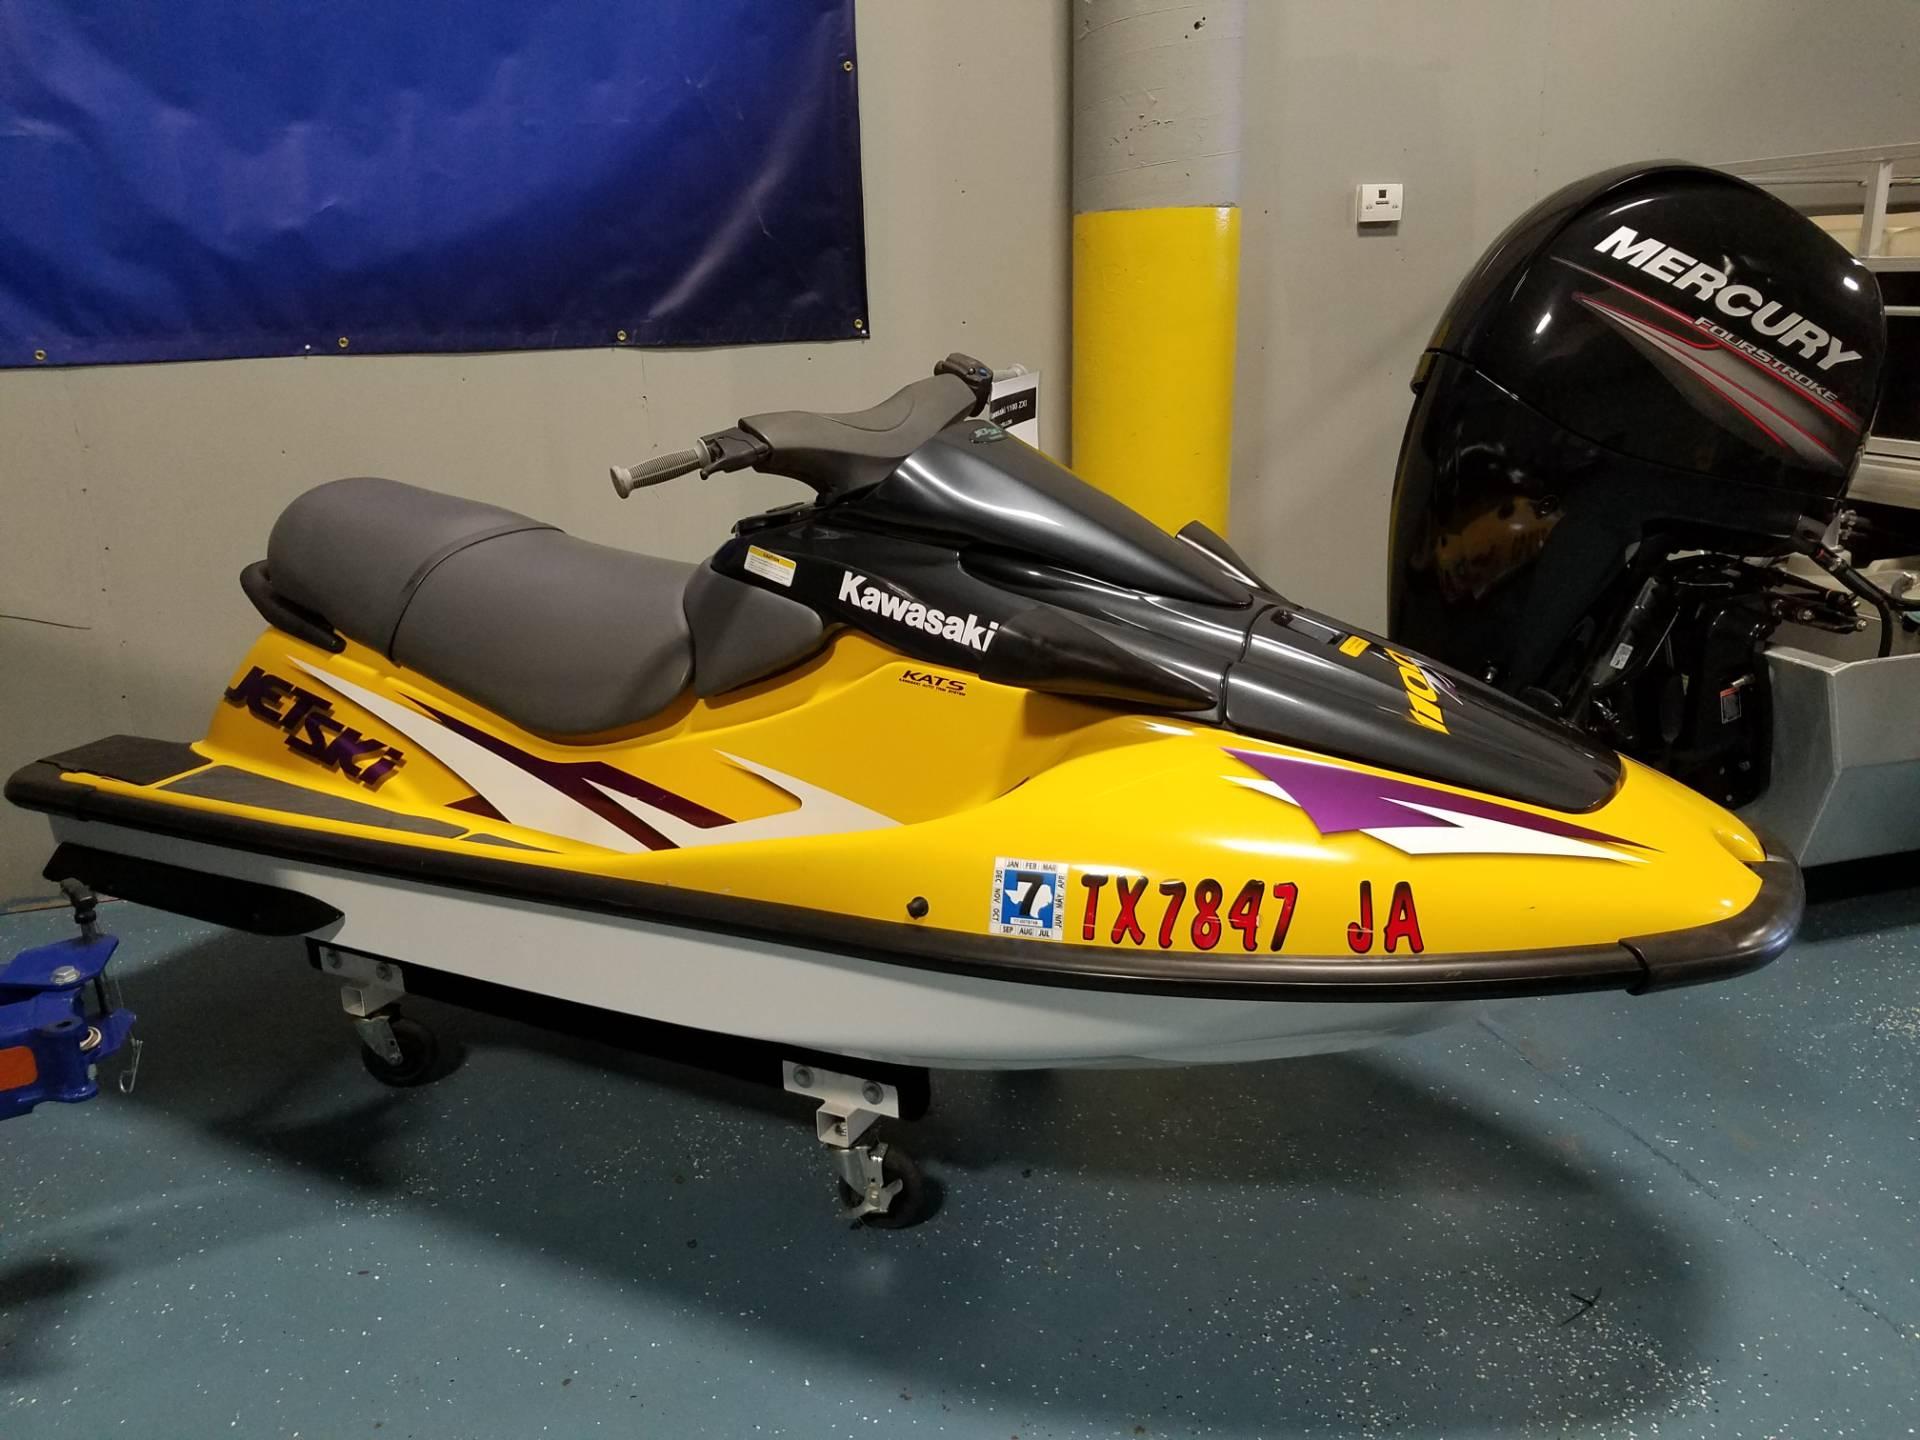 1998 Kawasaki 1100 Zxi 11 Foot Black Yellow 1998